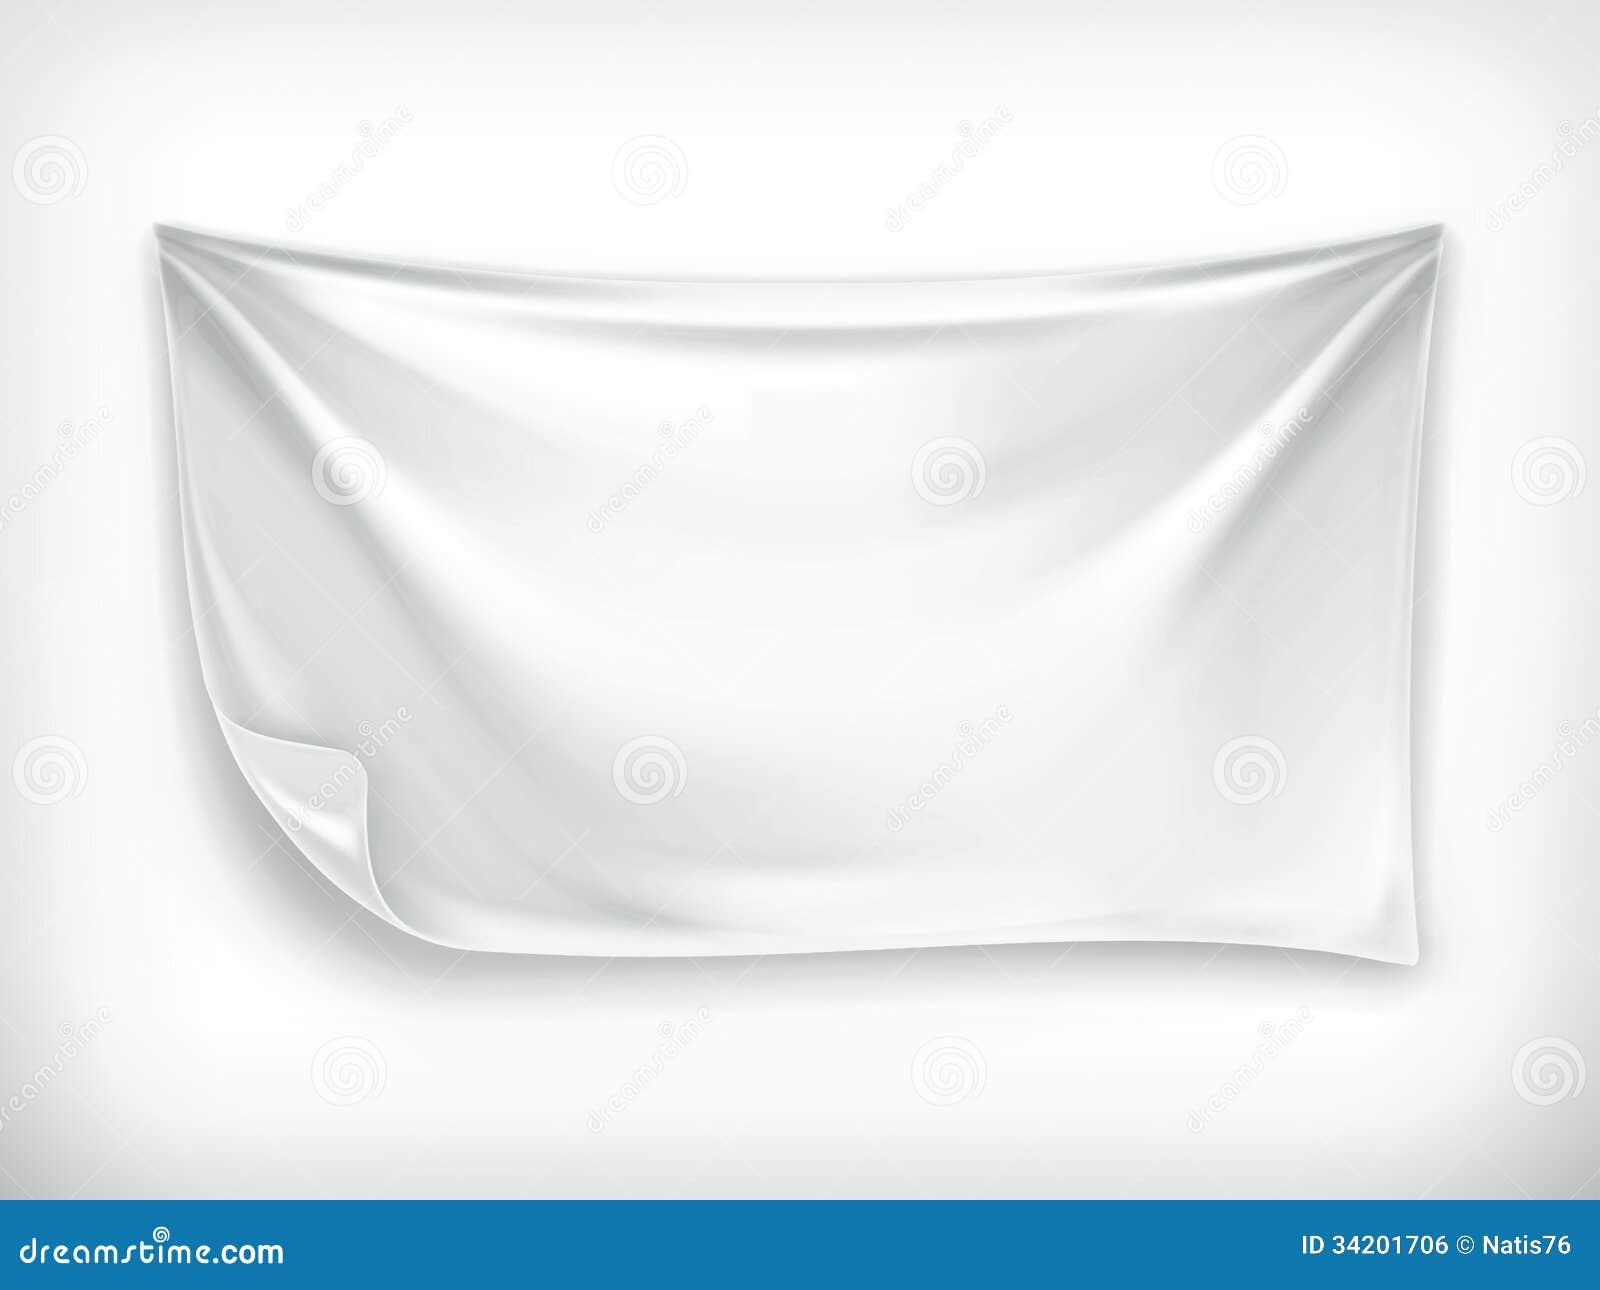 Blank Cloth Banner - Blank vinyl banners